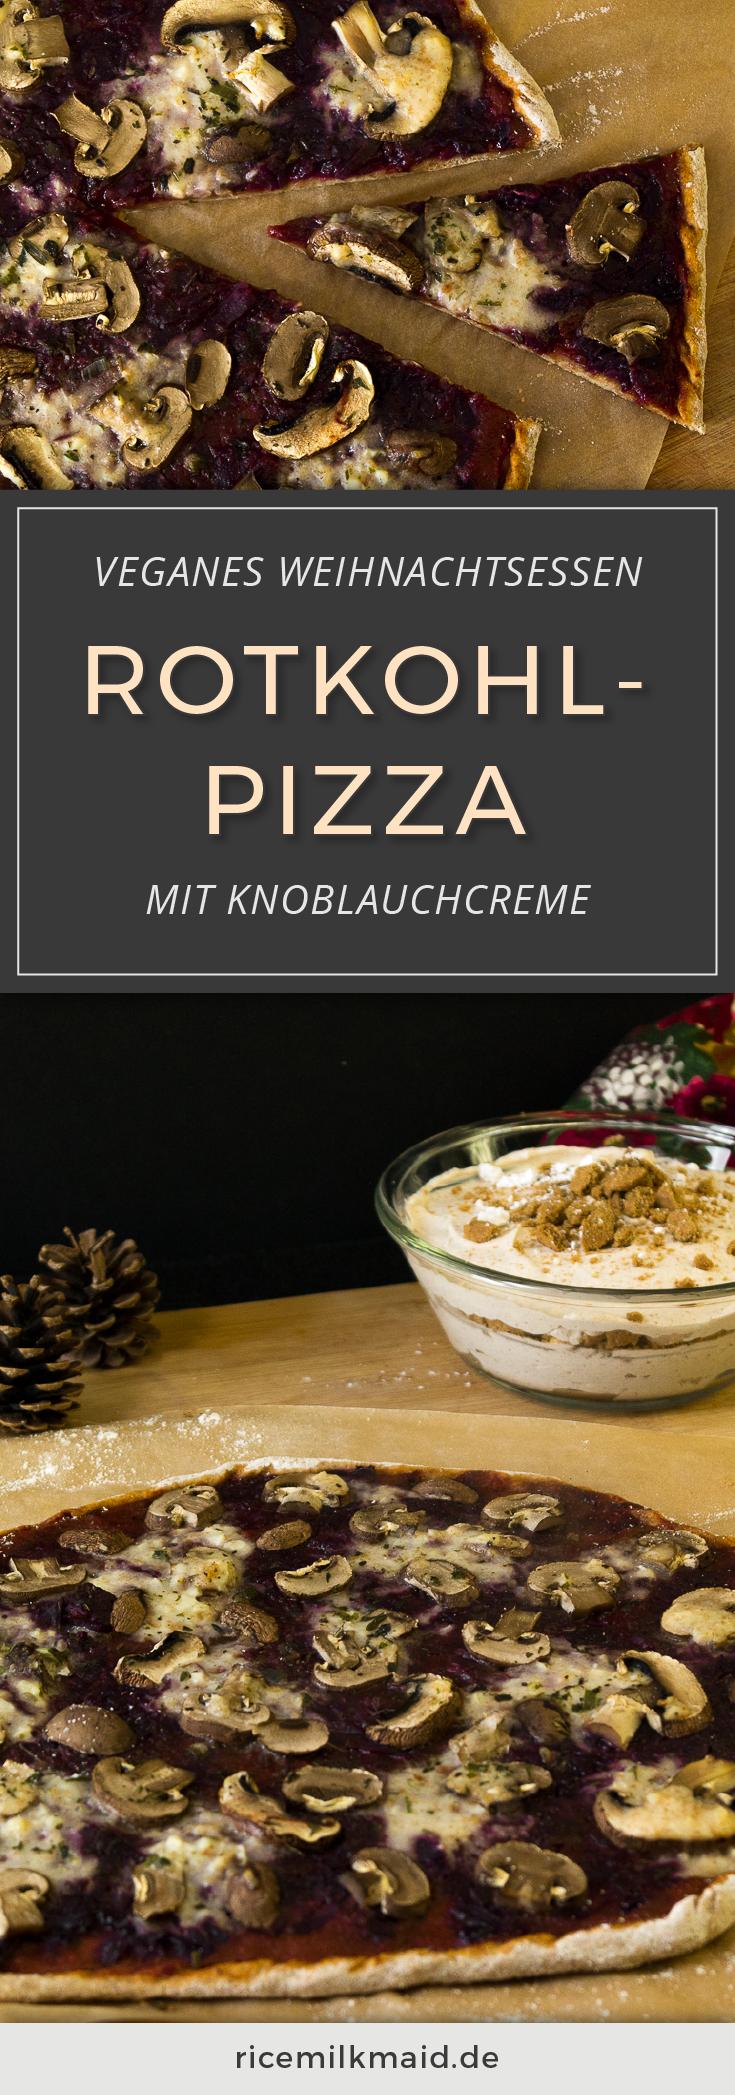 weihnachtliche pizza rezept ricemilkmaid blog. Black Bedroom Furniture Sets. Home Design Ideas